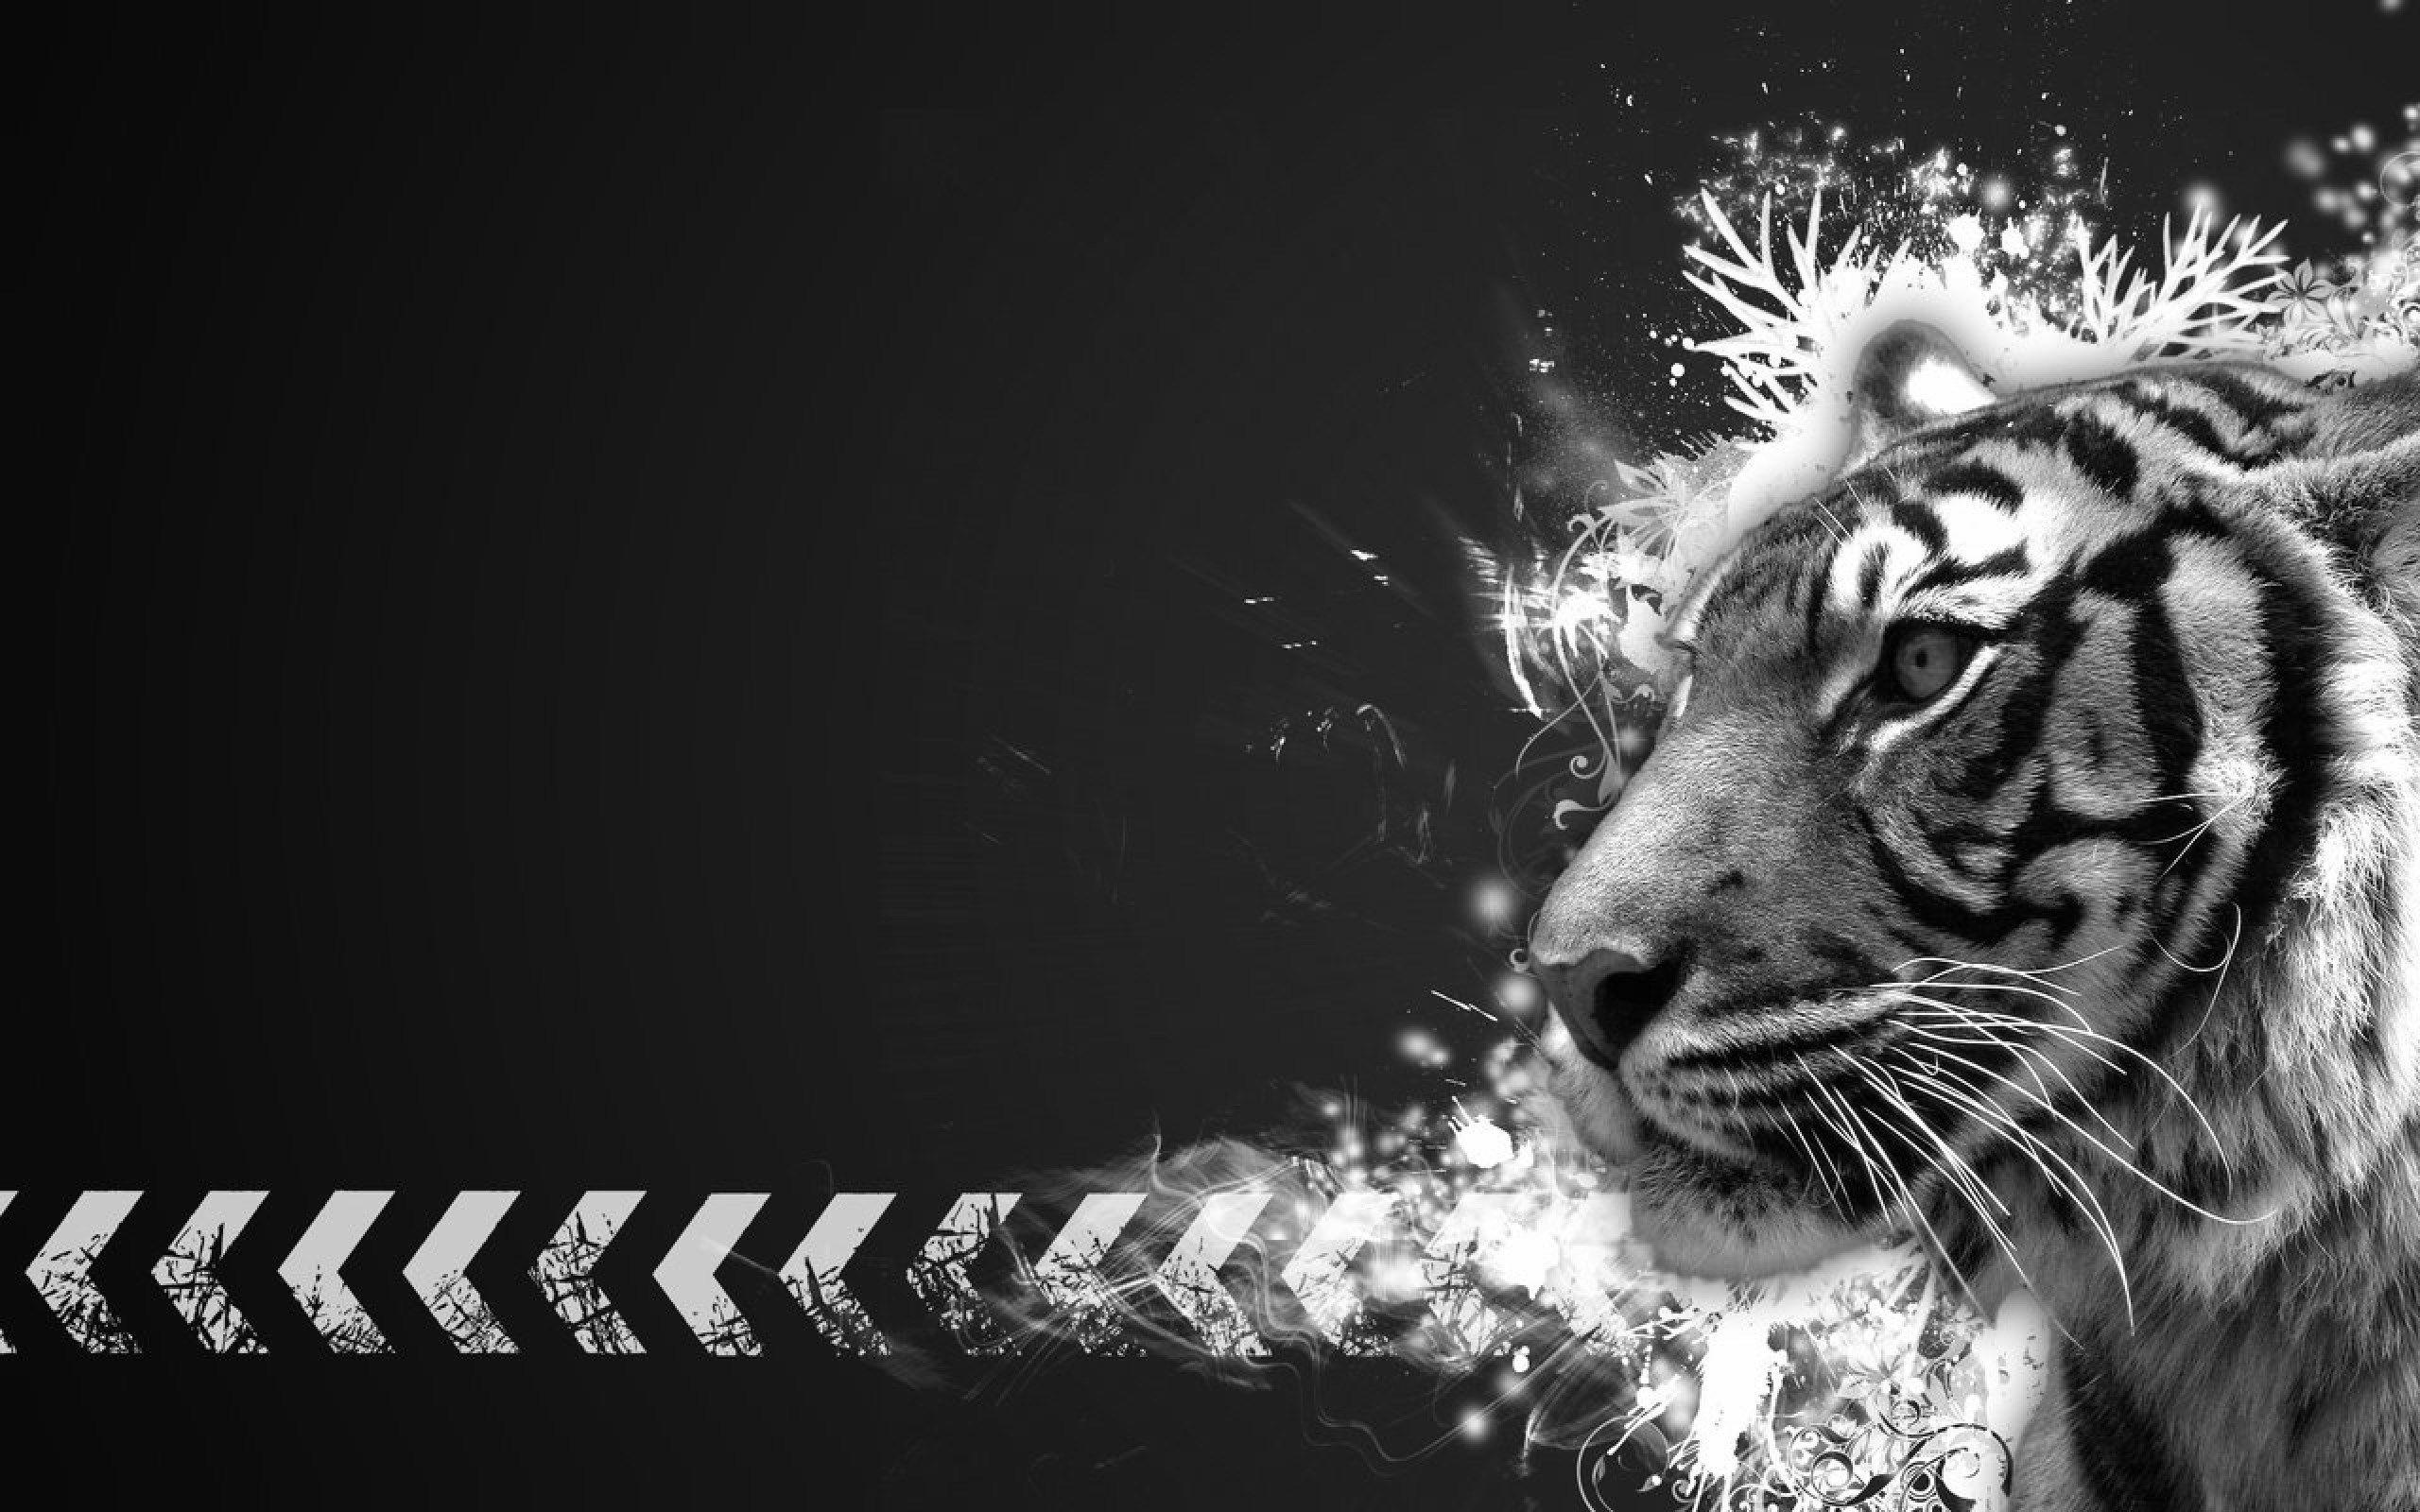 Hq definition wallpaper desktop tiger backround tiger category hq definition wallpaper desktop tiger backround tiger category thecheapjerseys Image collections